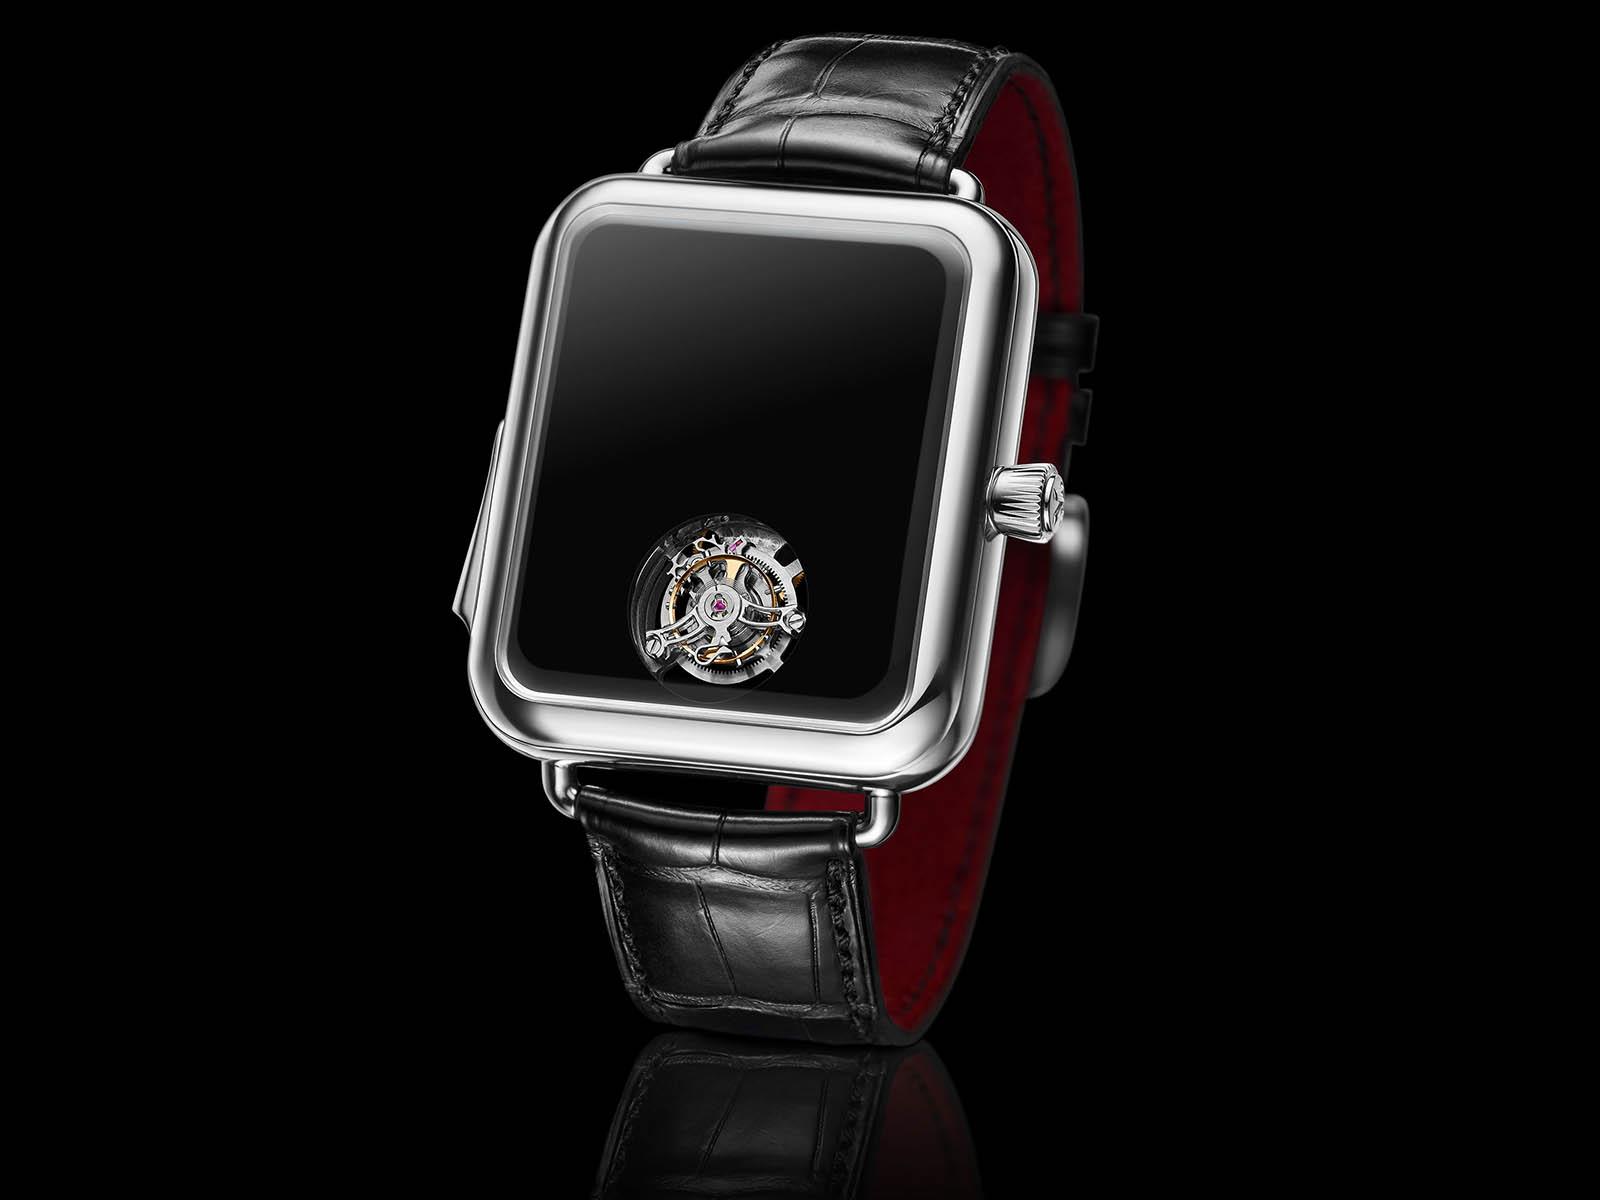 5901-0301-h-moser-cie-swiss-alp-watch-minute-repeater-concept-black-2.jpg